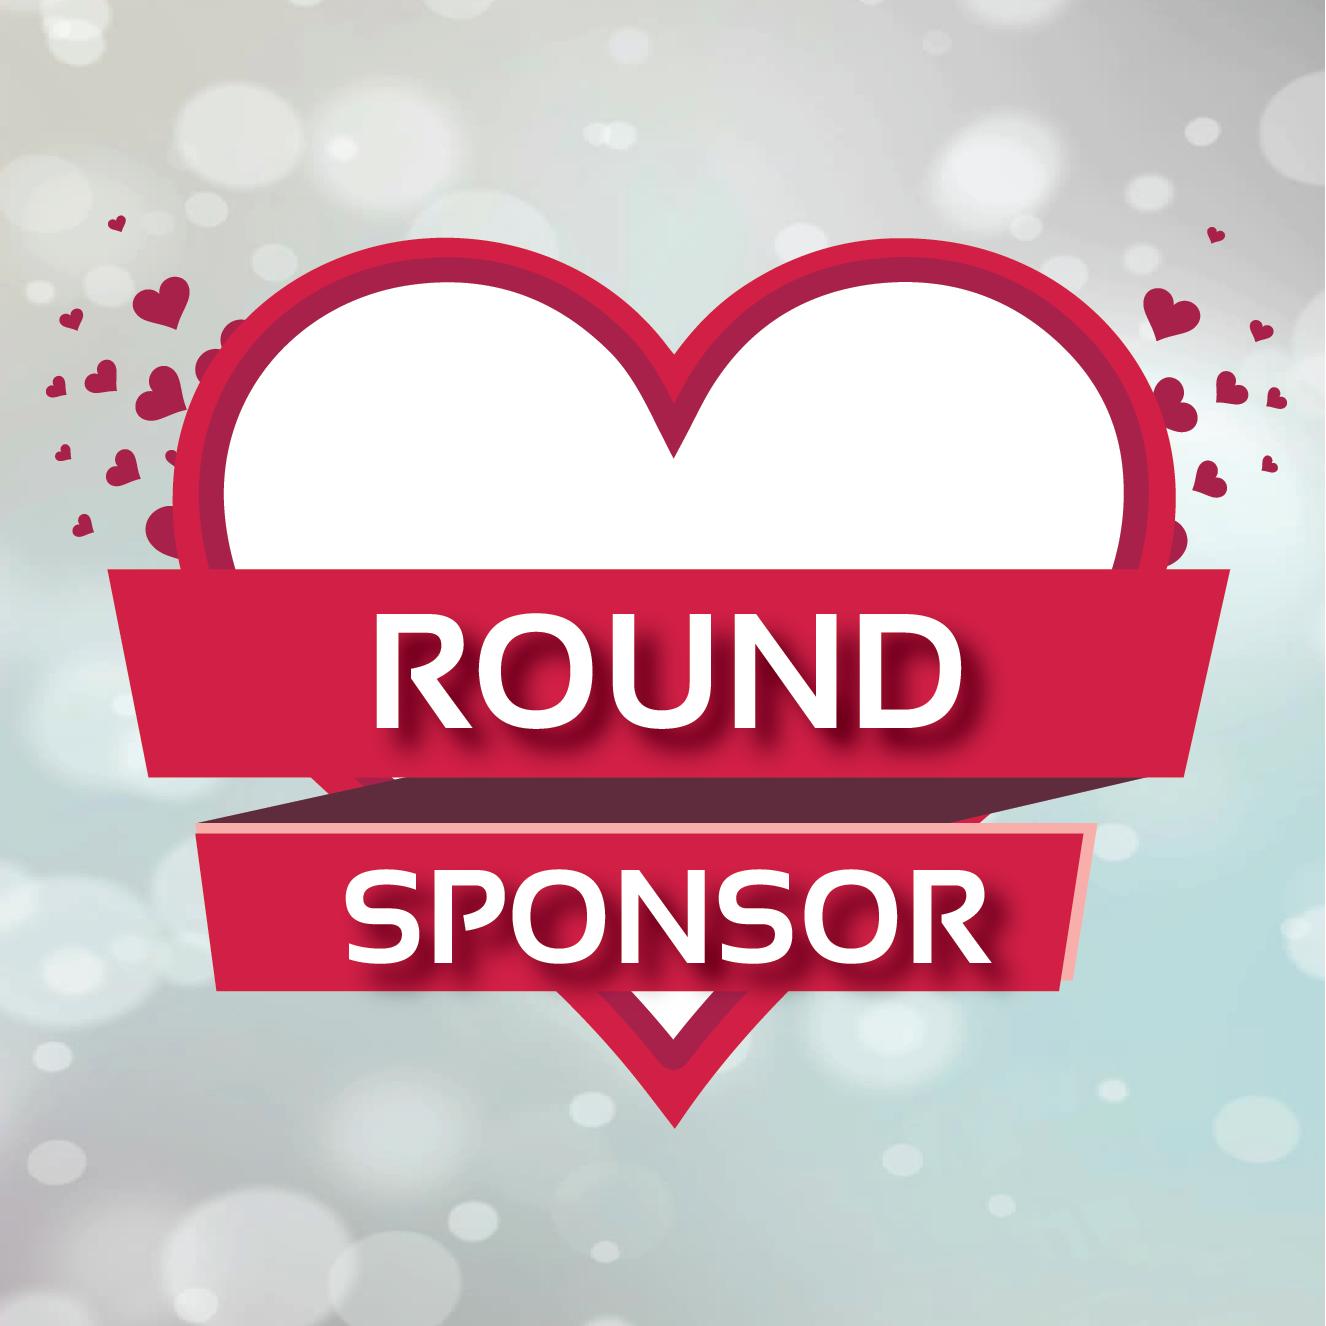 Round Sponsor